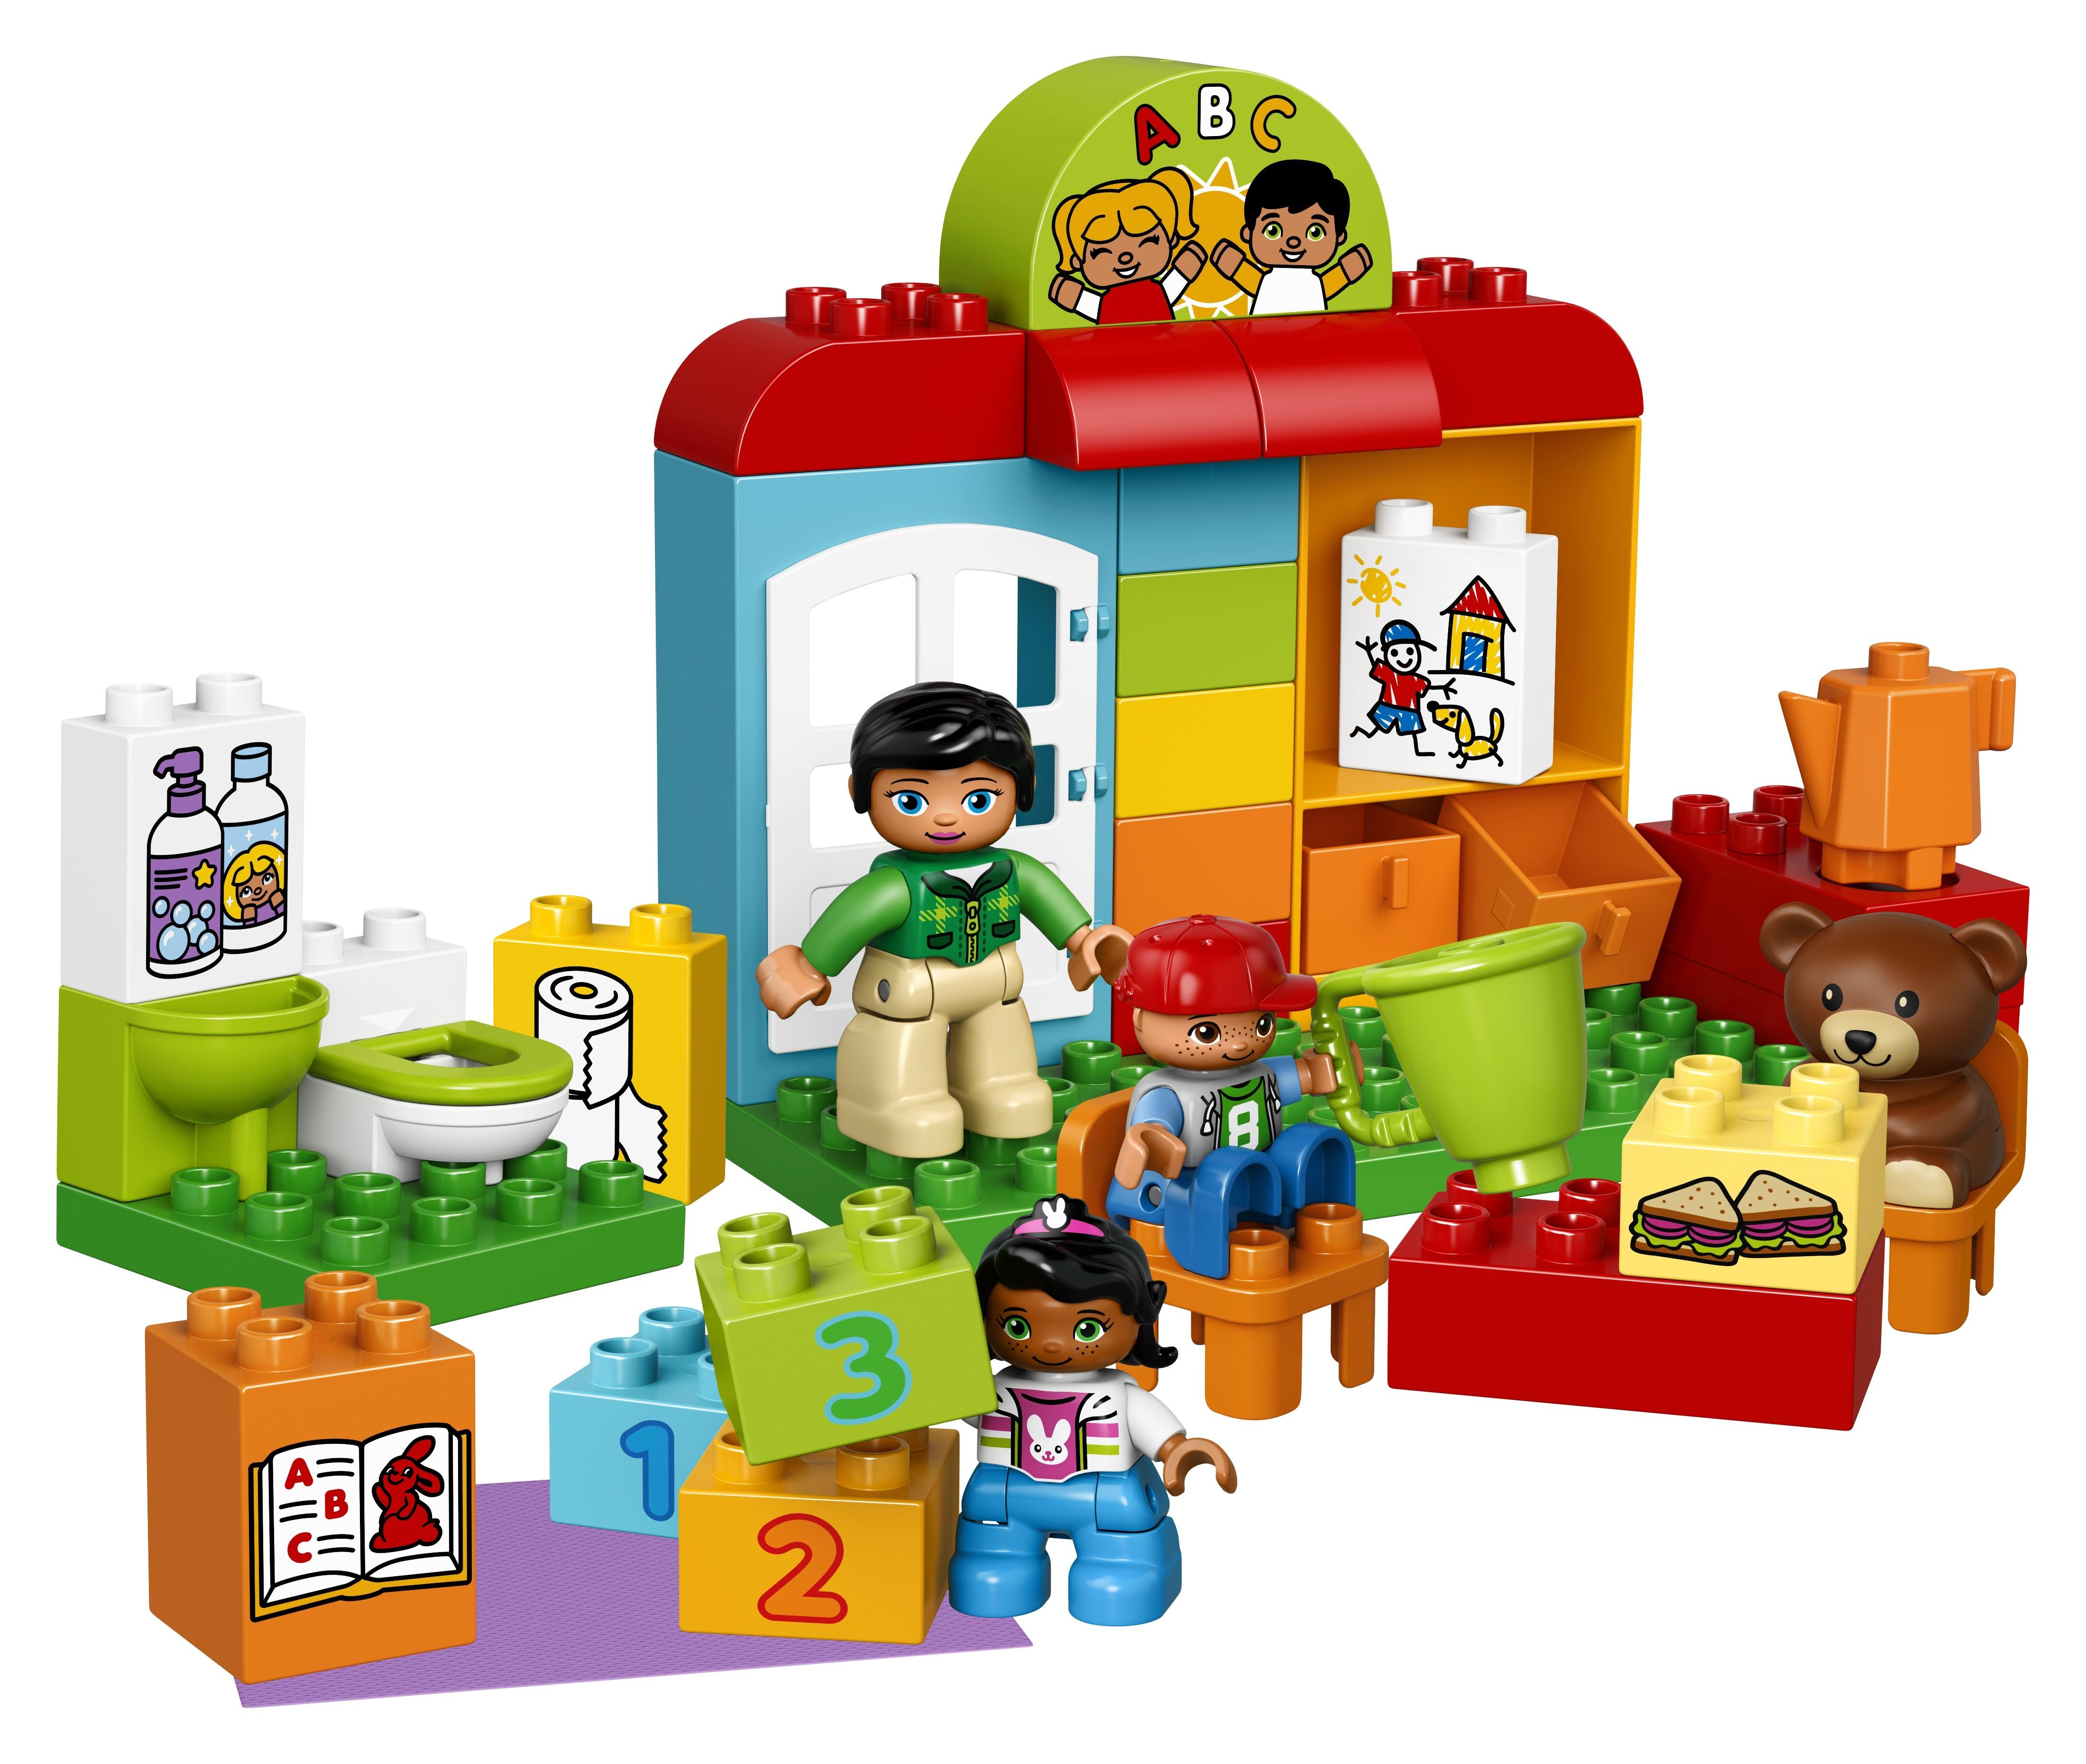 Конструктор LEGO Duplo Town 10833 Детский сад цена